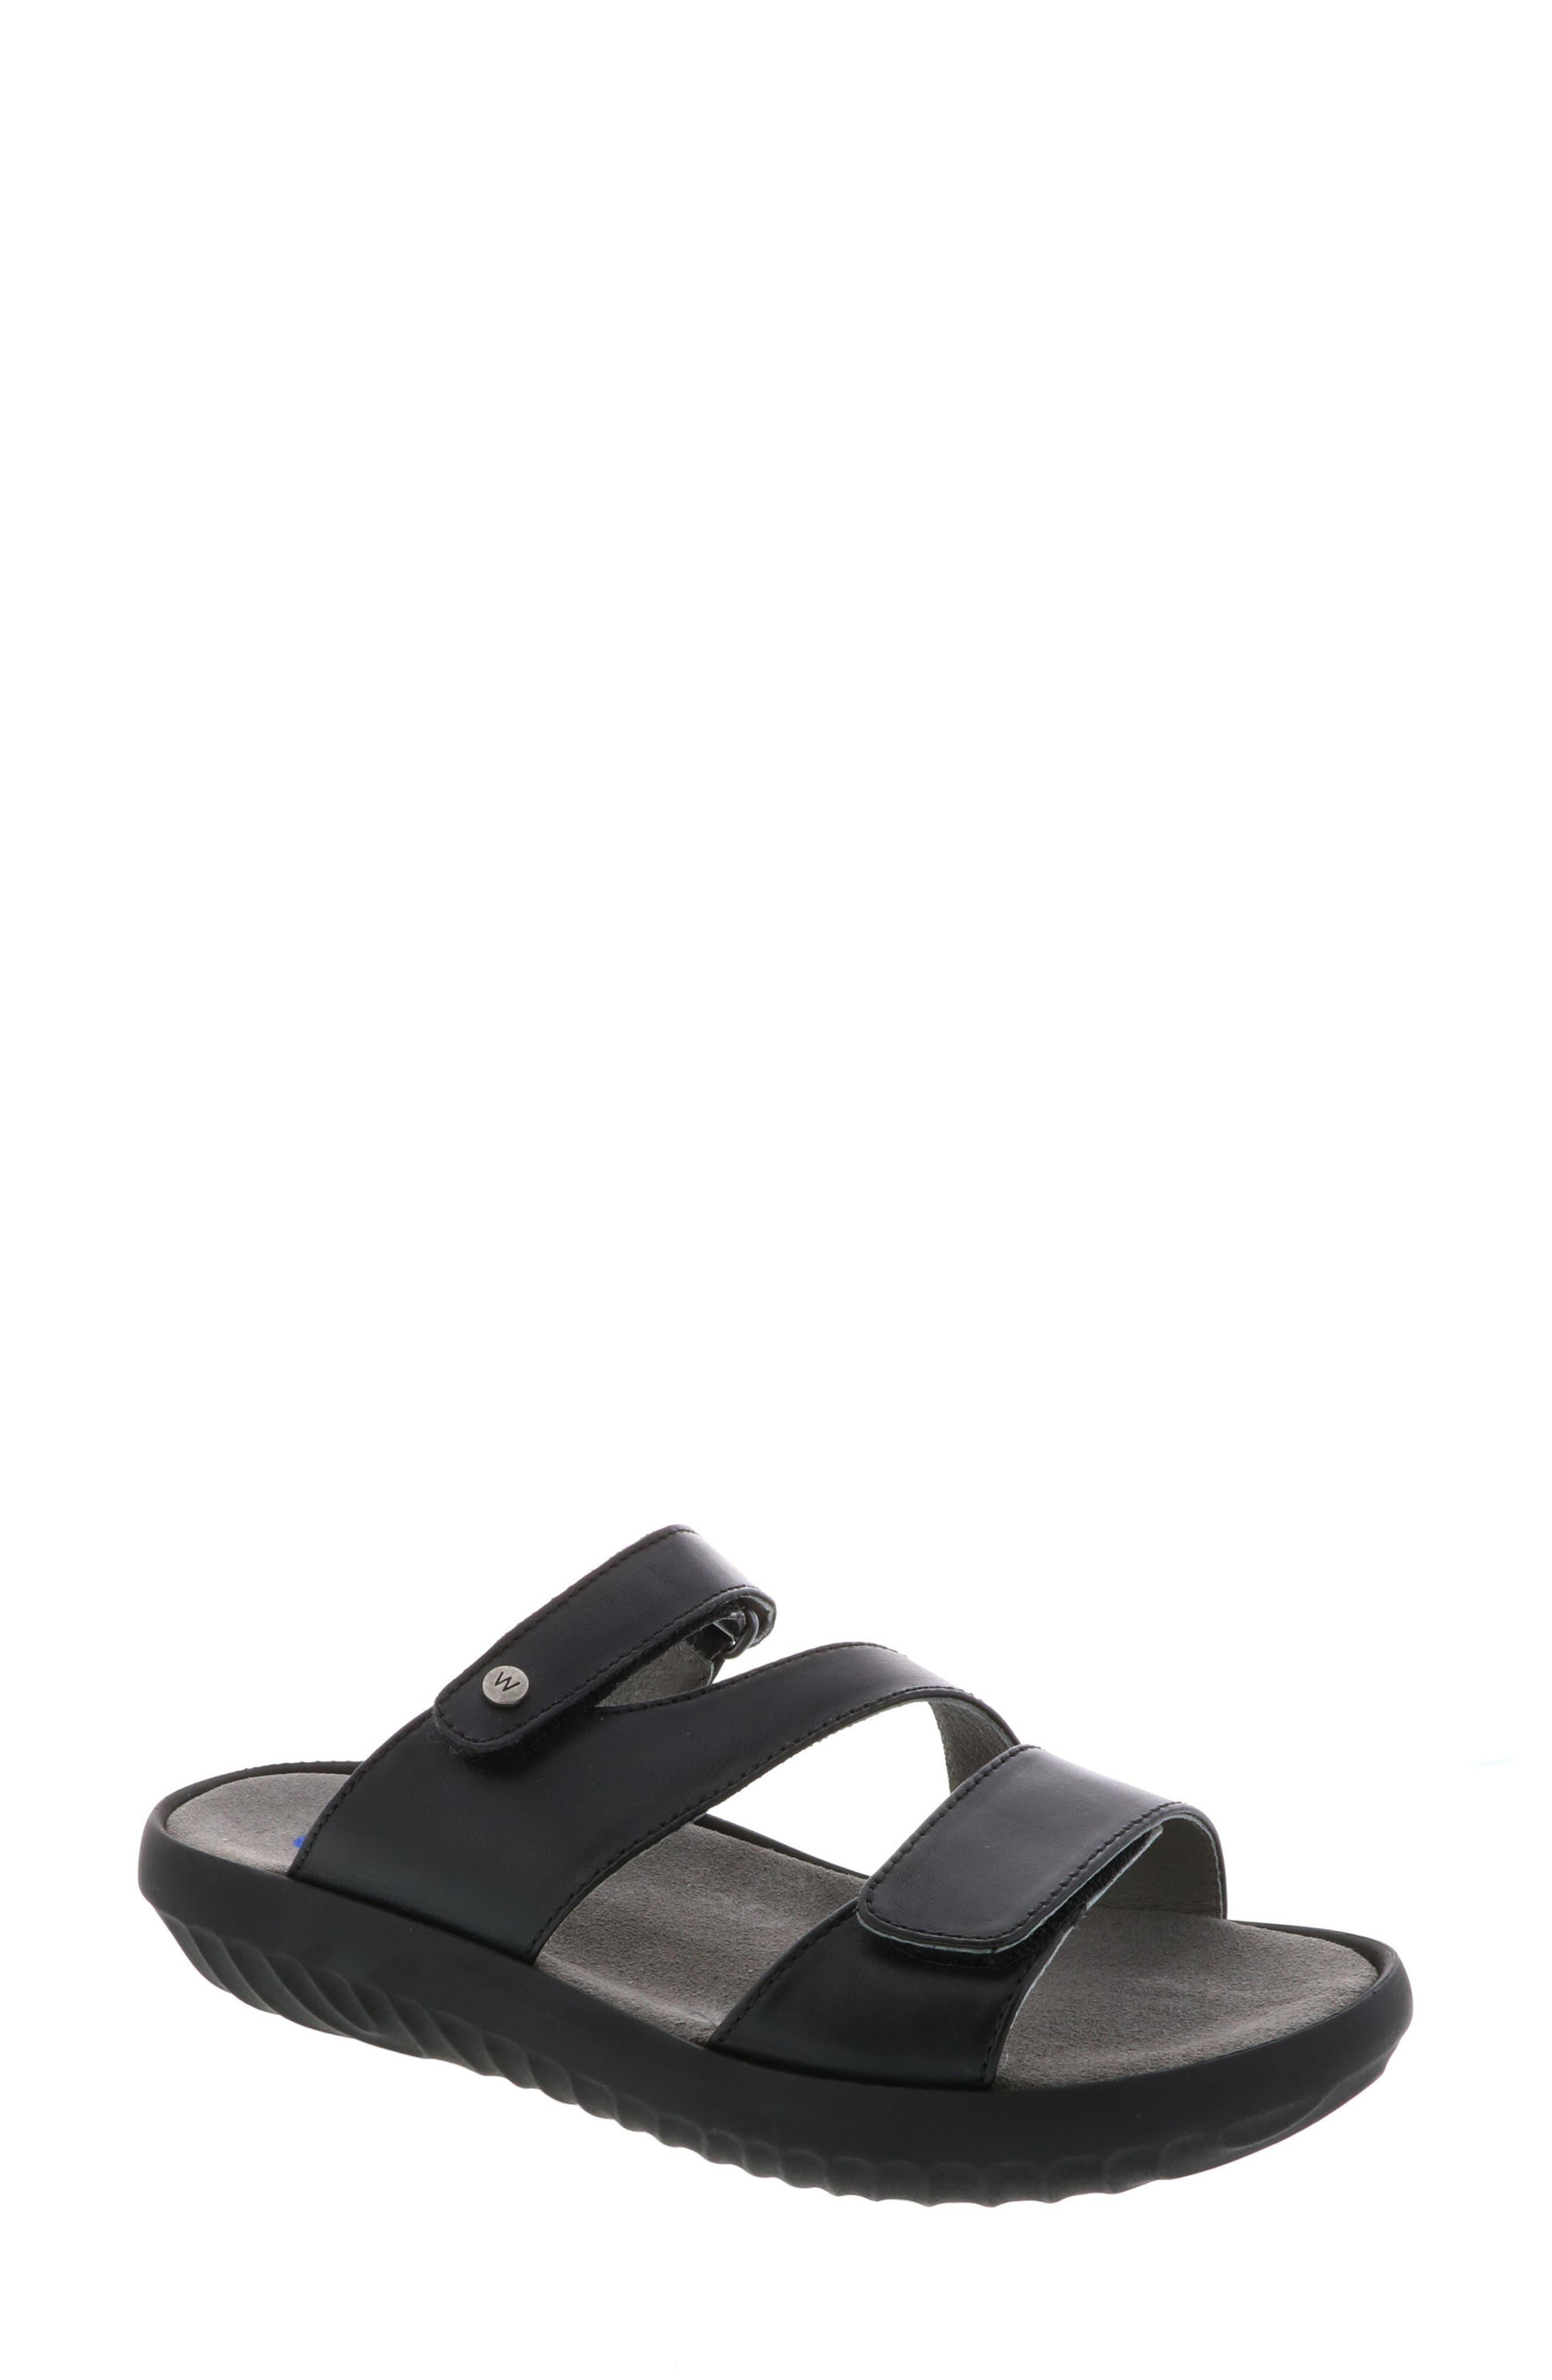 Sense Slide Sandal,                             Main thumbnail 1, color,                             BLACK